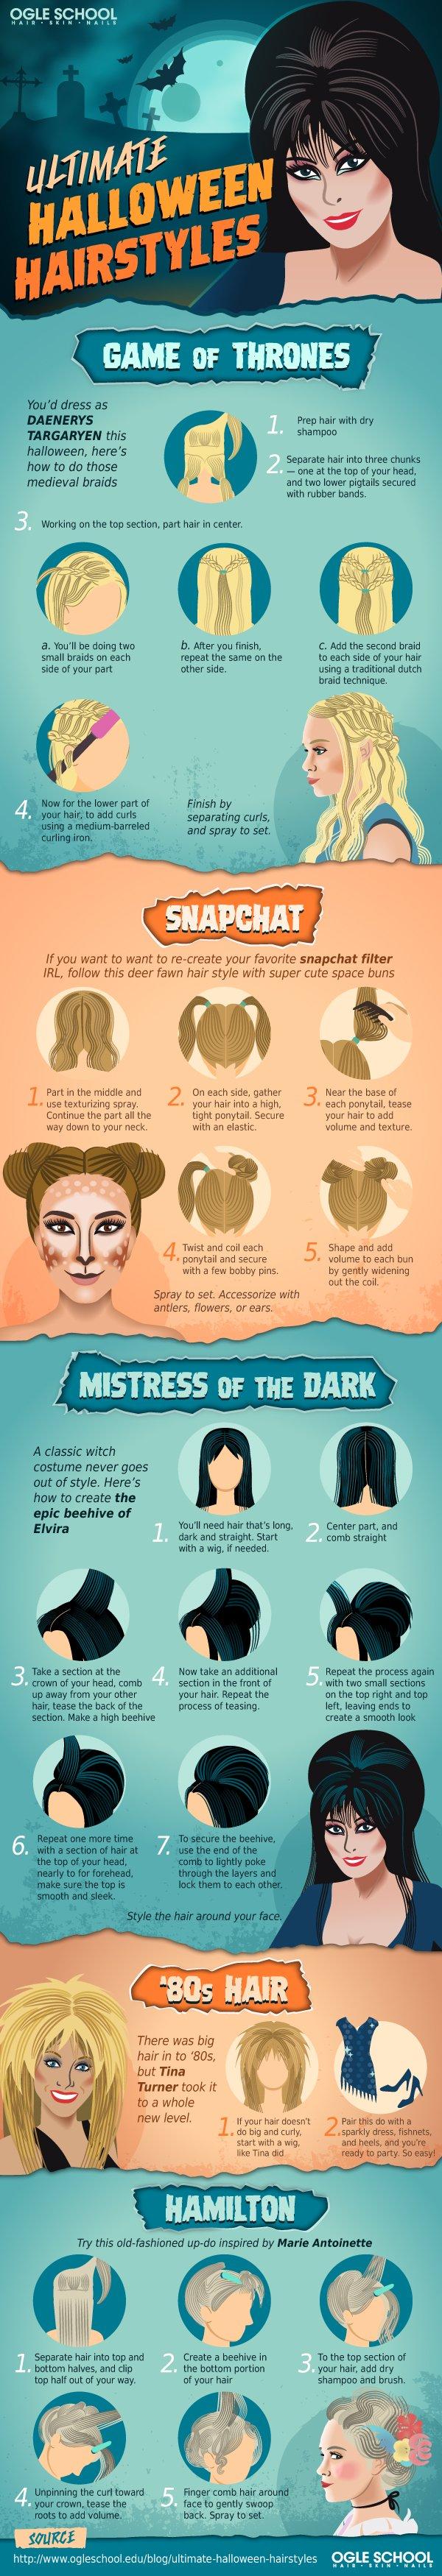 Ultimate-Halloween-Hairstyles_IG